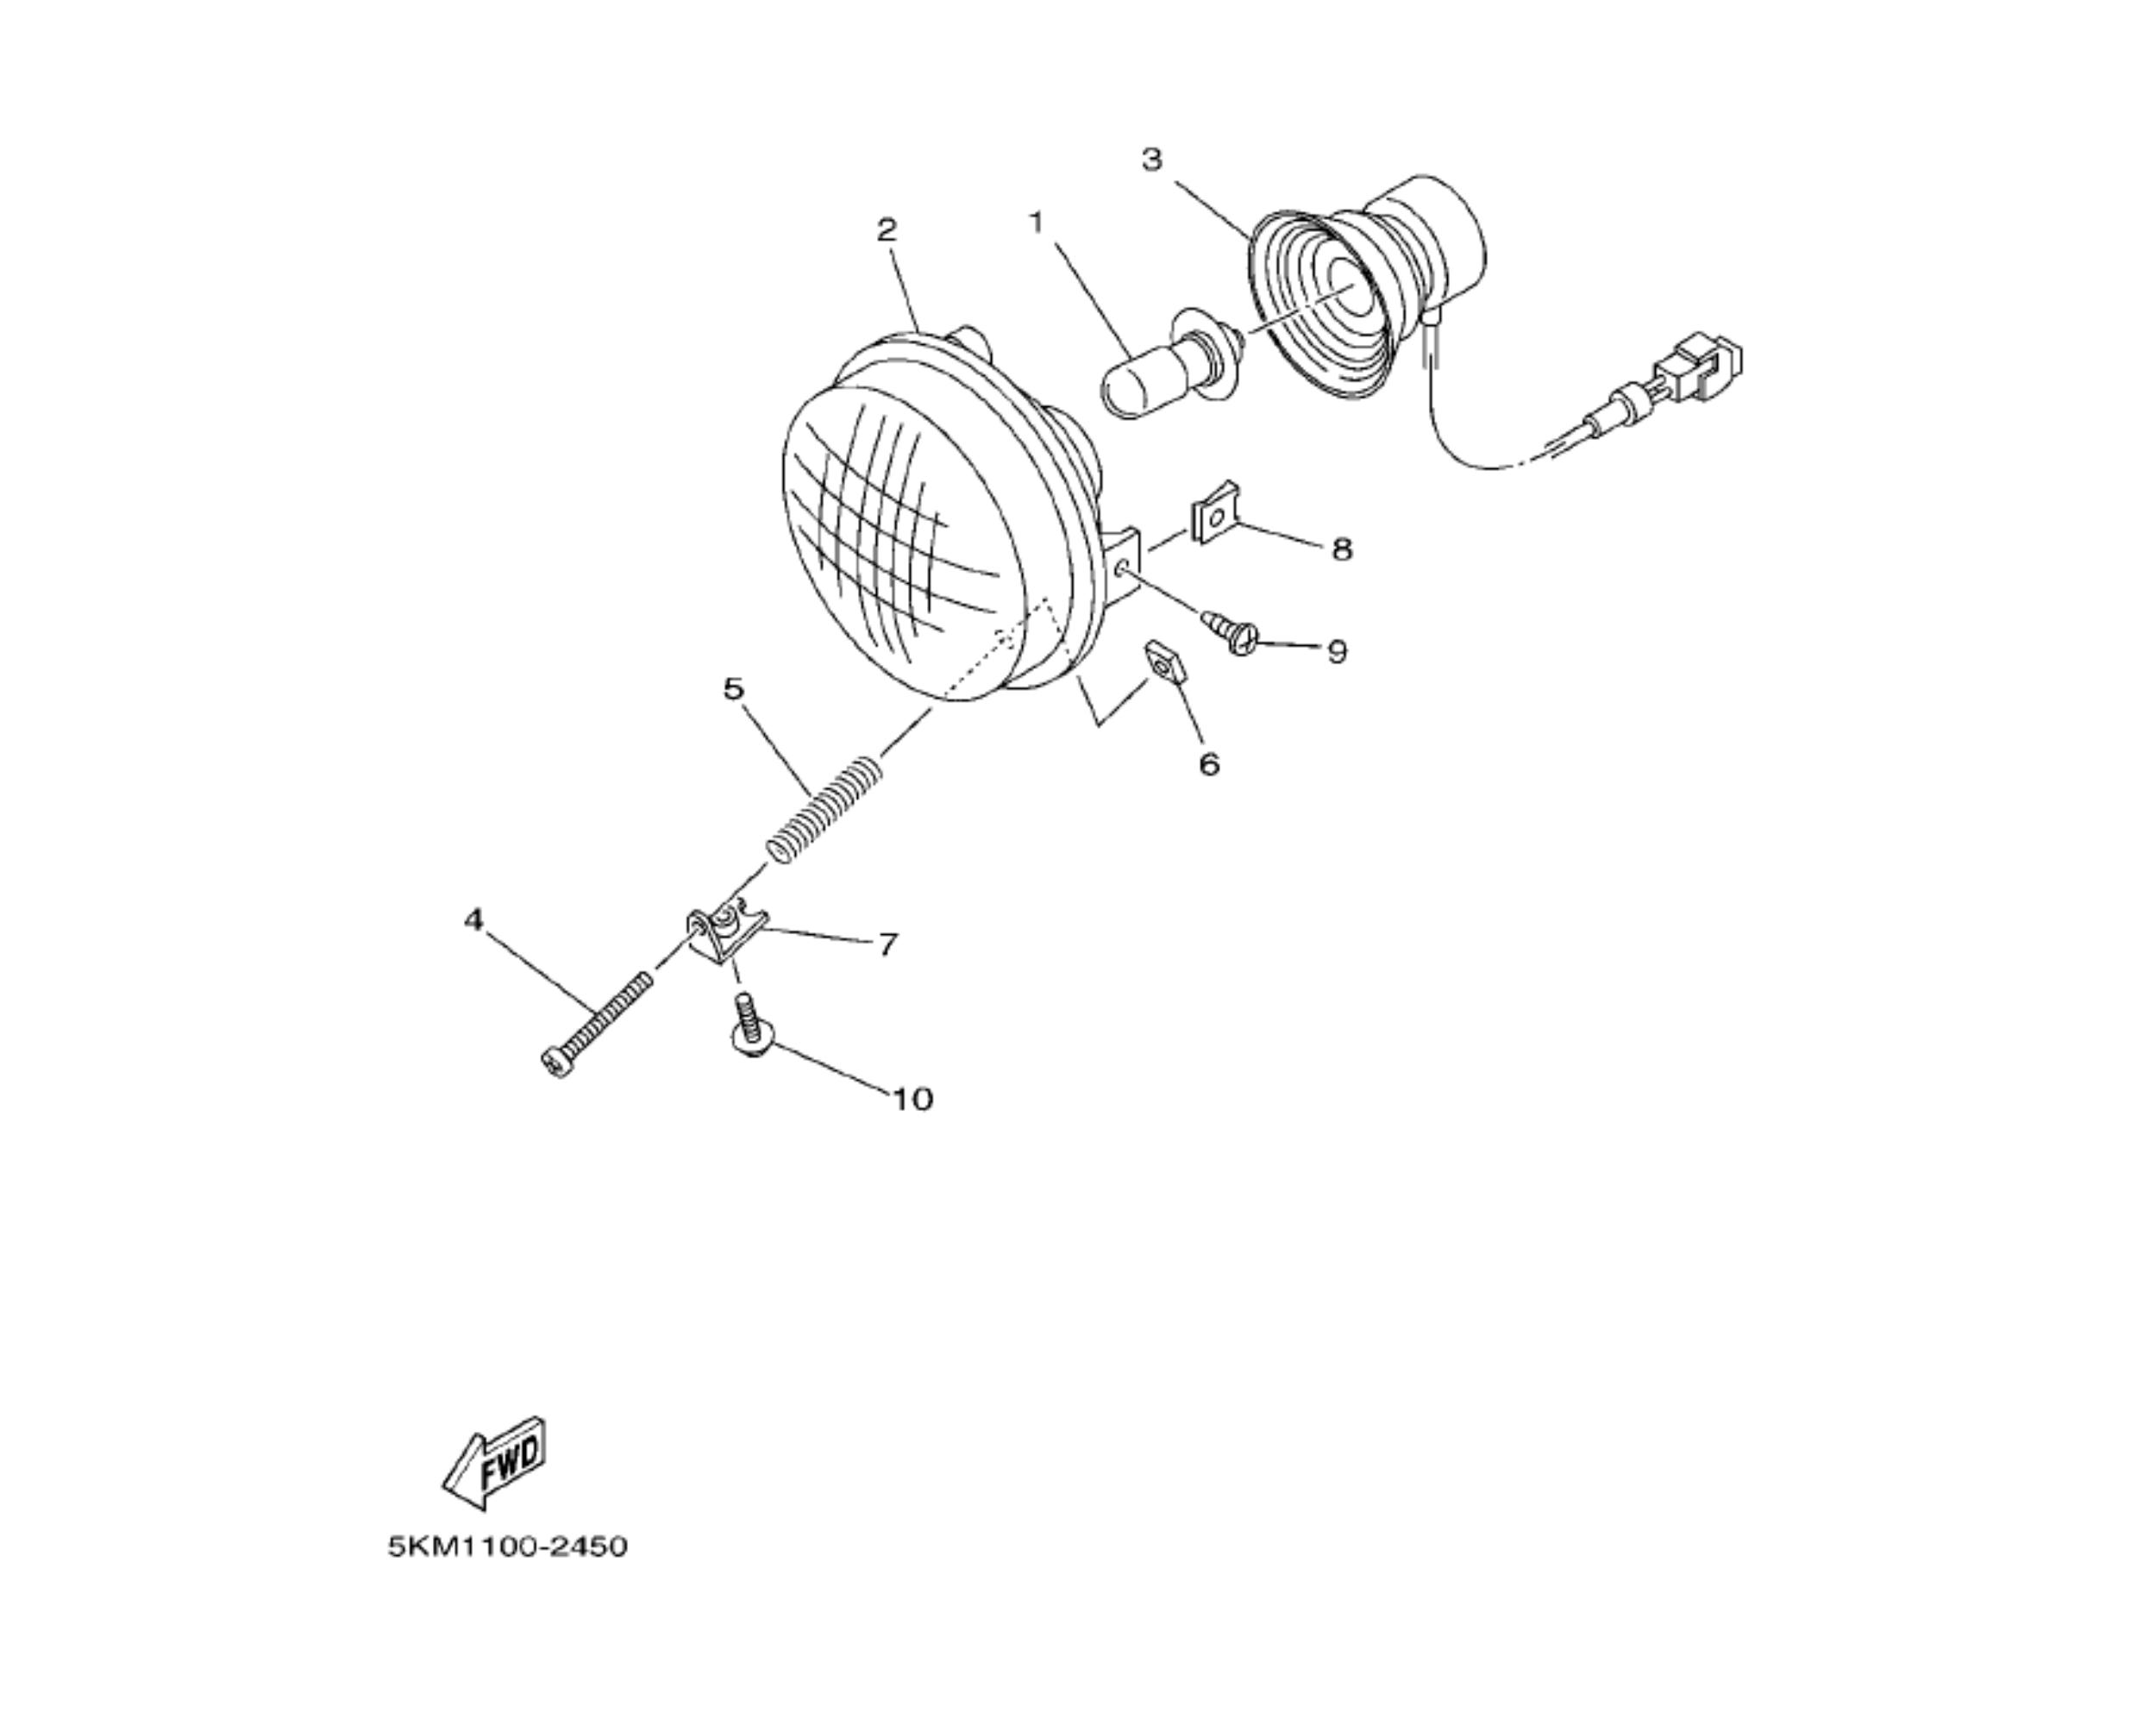 Scheinwerfer | Rahmen & Anbauteile | Grizzly 660 Bj. 2006 ... on